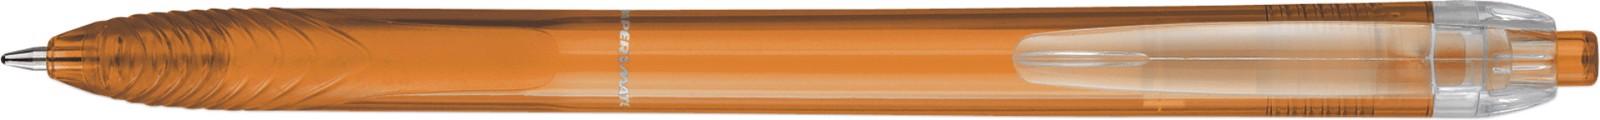 Plastic Papermate gel ballpen 'Vergo' - Orange